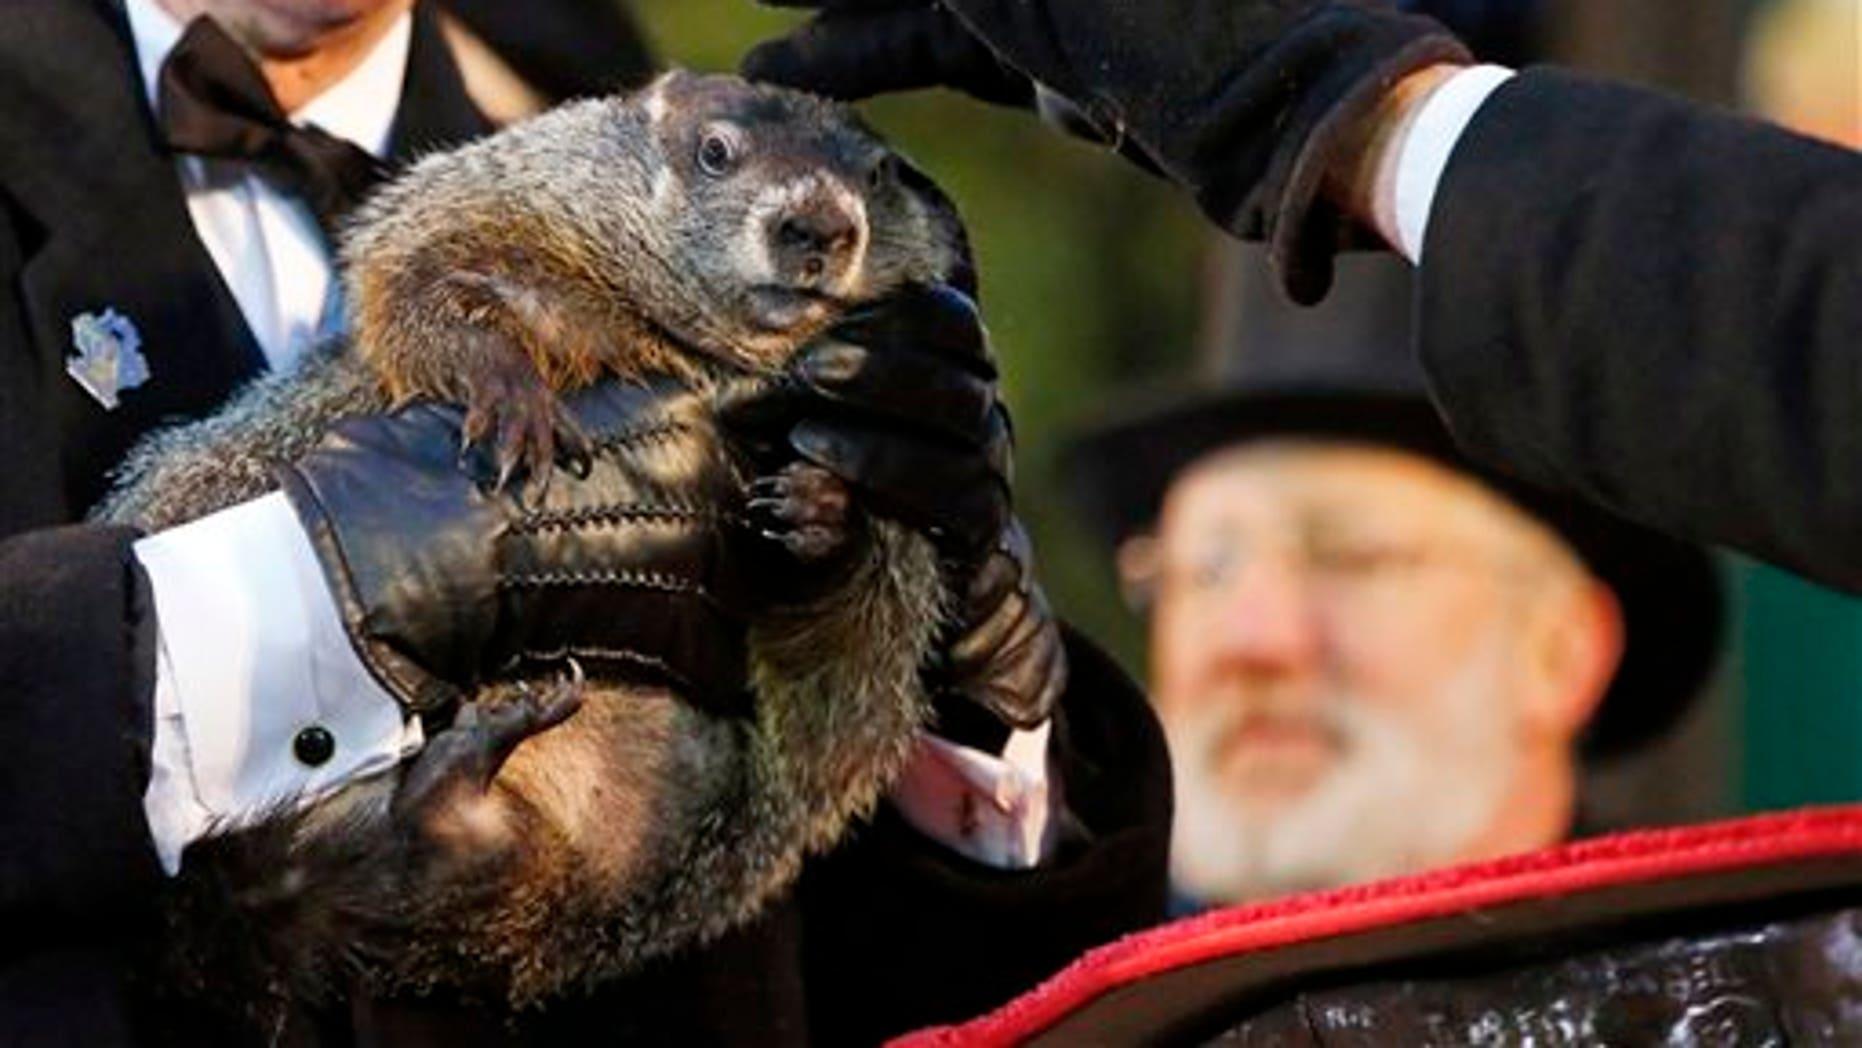 Feb. 2: Groundhog Club handler Ron Ploucha holds Punxsutawney Phil, the weather prognosticating groundhog, as co-handler John Griffiths rubs his head, during the 129th celebration of Groundhog Day on Gobble's Knob in Punxsutawney, Pa.